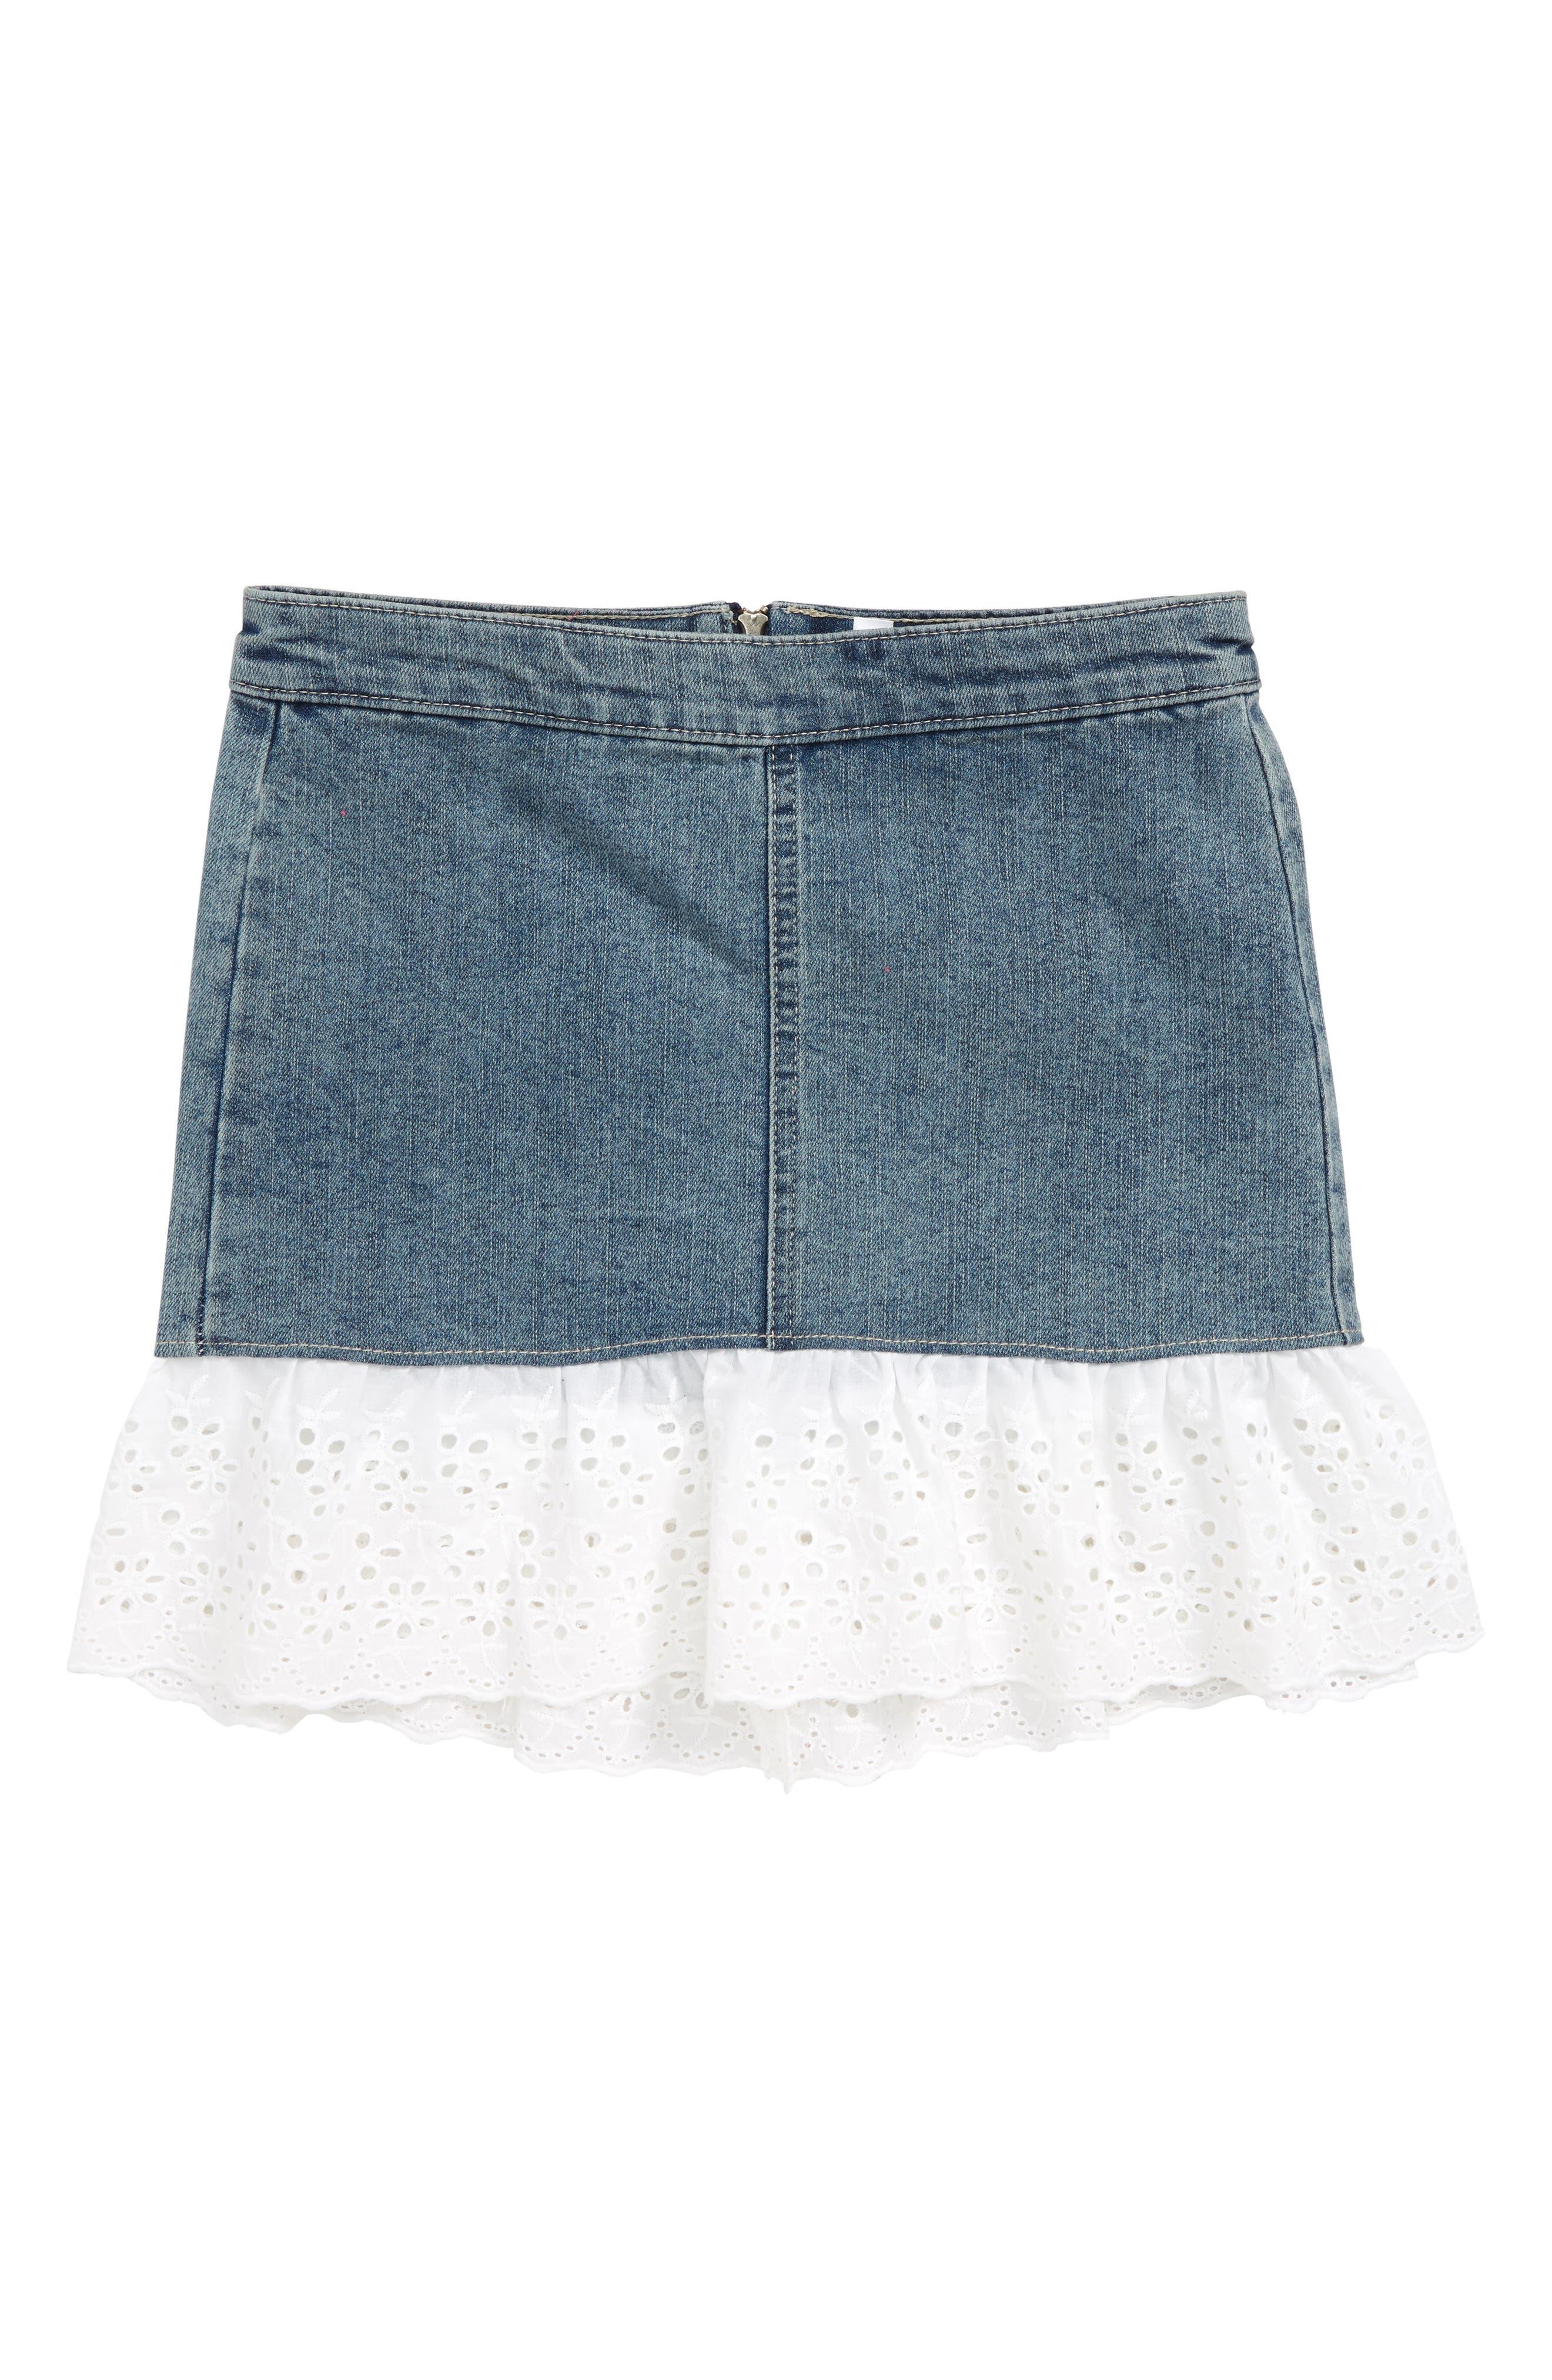 Denim Skirt,                         Main,                         color, Marissa Wash